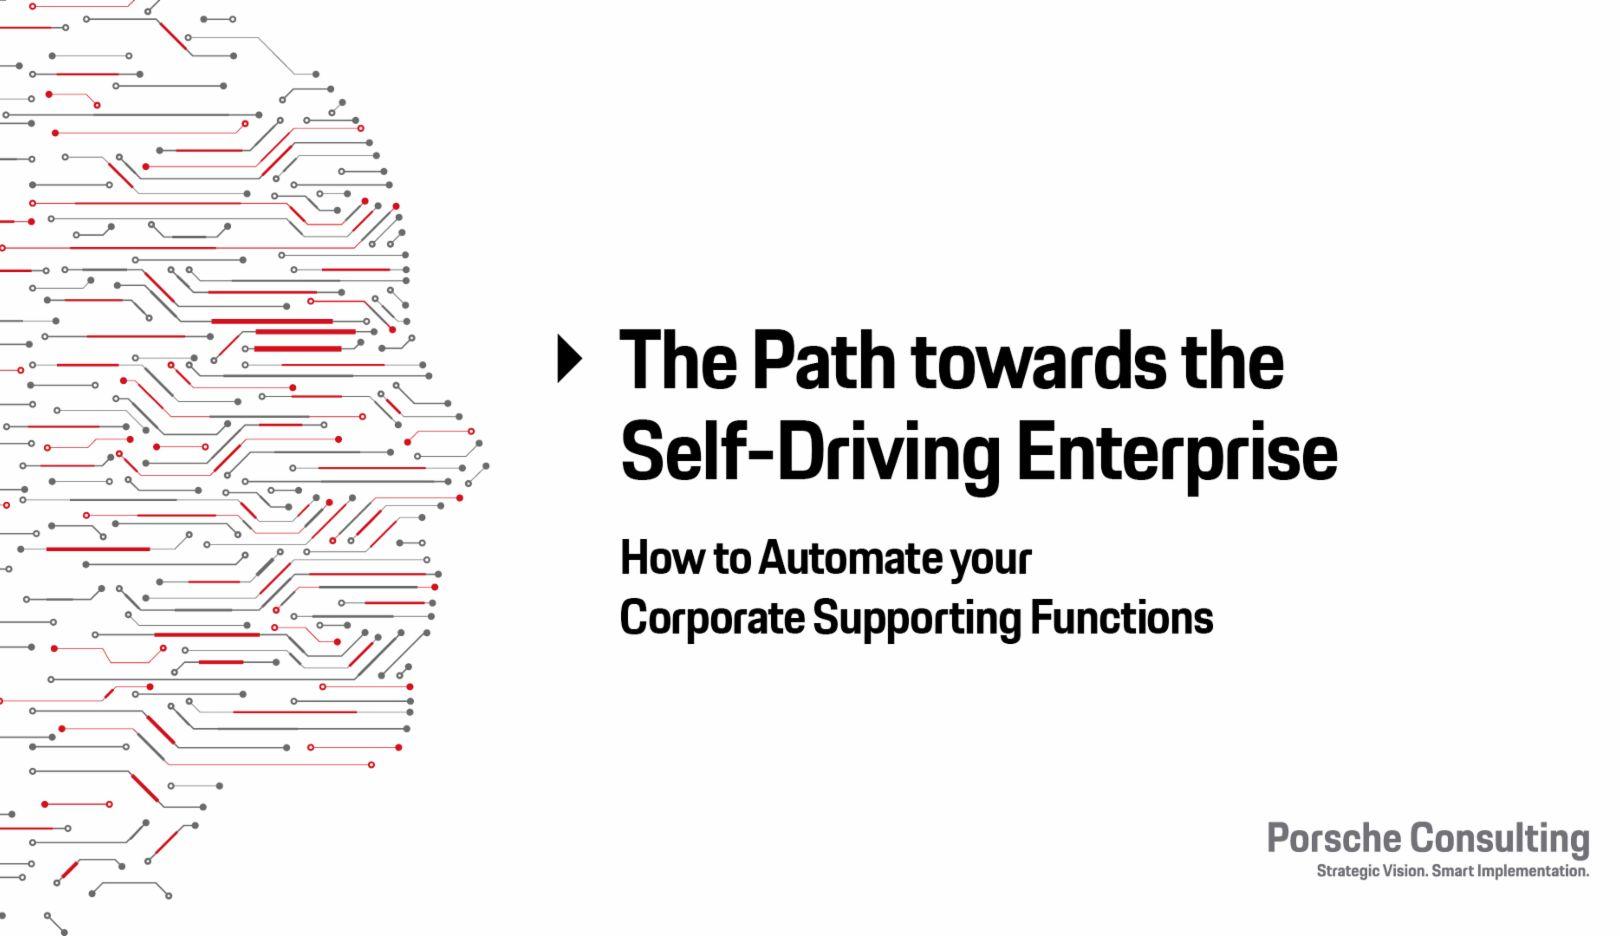 The Path towards the Self-Driving Enterprise, 2018, Porsche Consulting GmbH